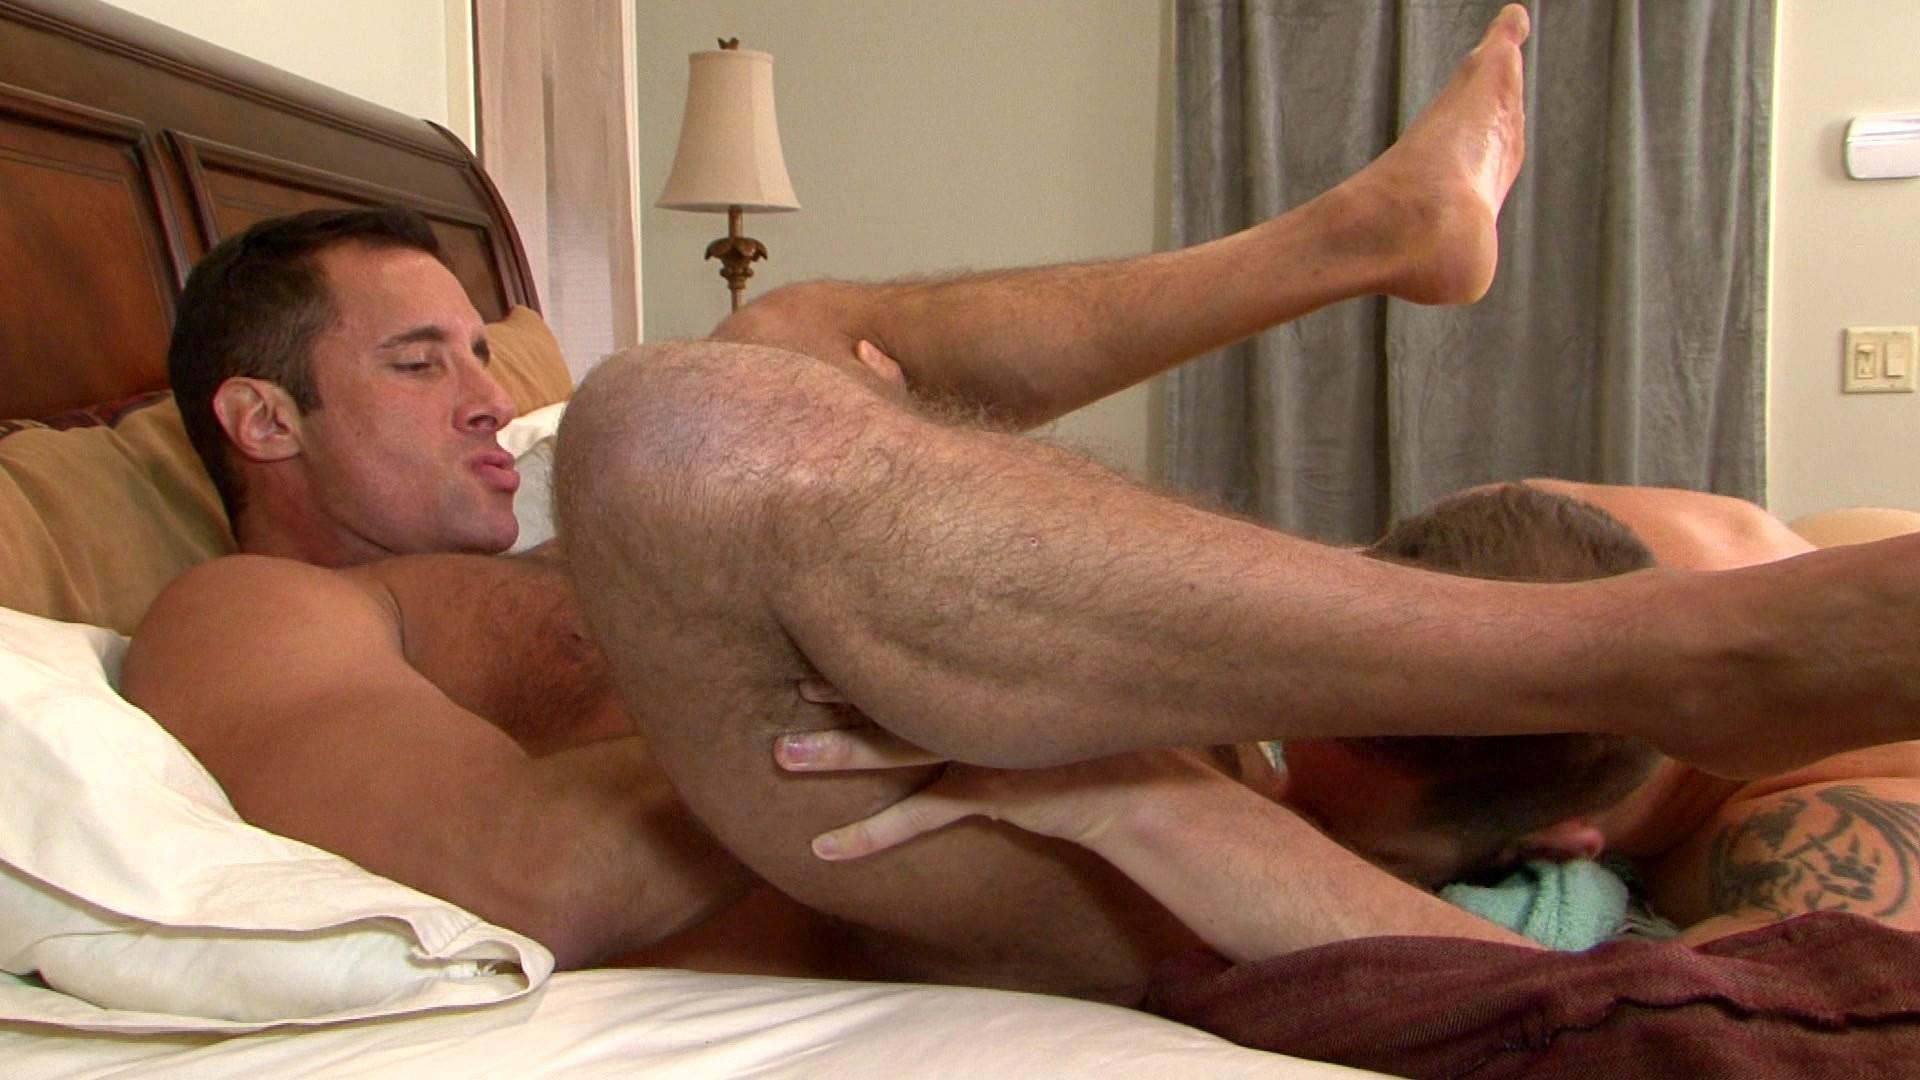 from Chaim gay play daddies vol 7